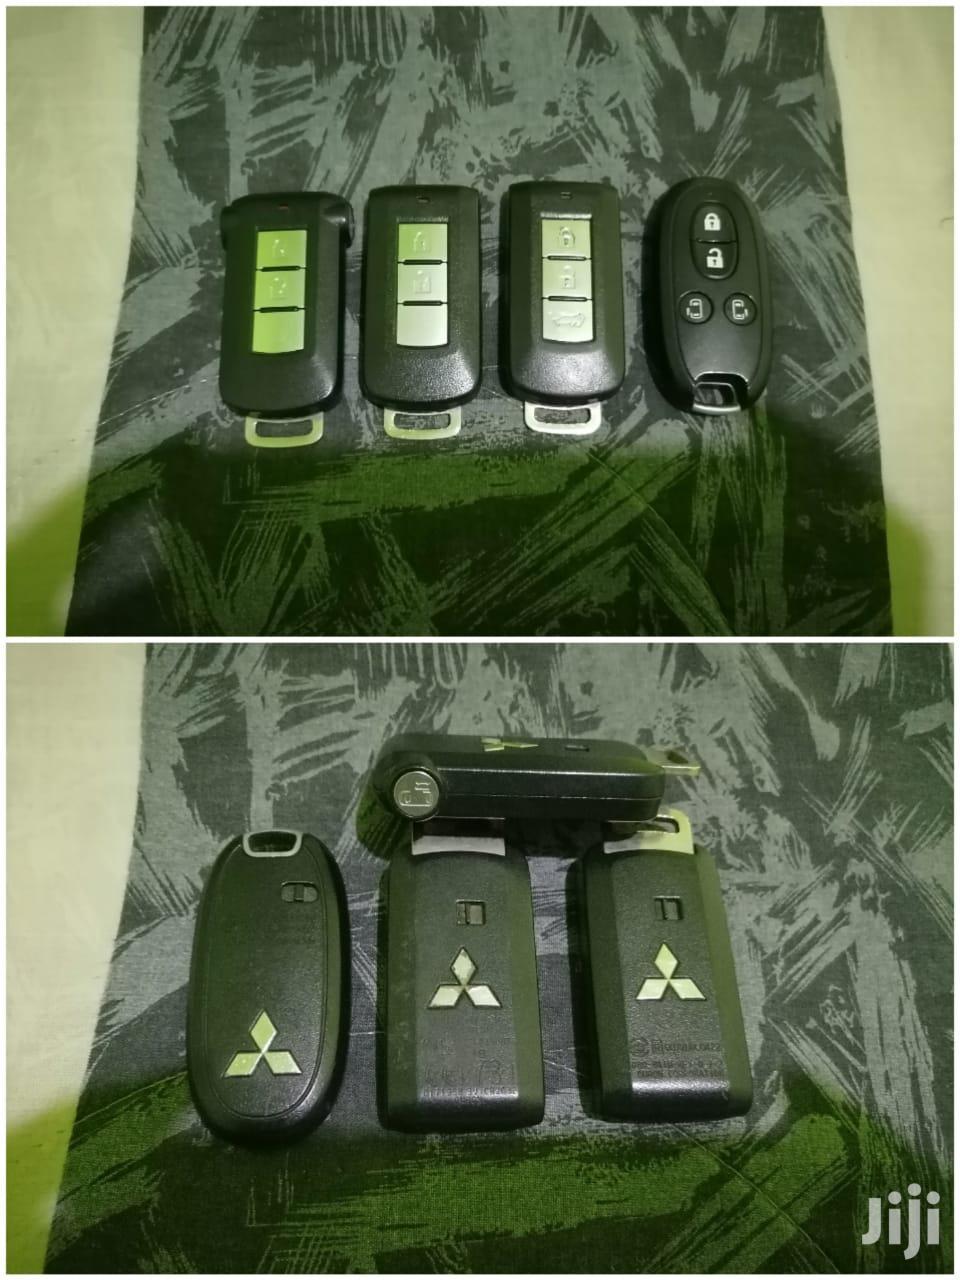 Mitsubishi 3 And 4 Button Spare Key.